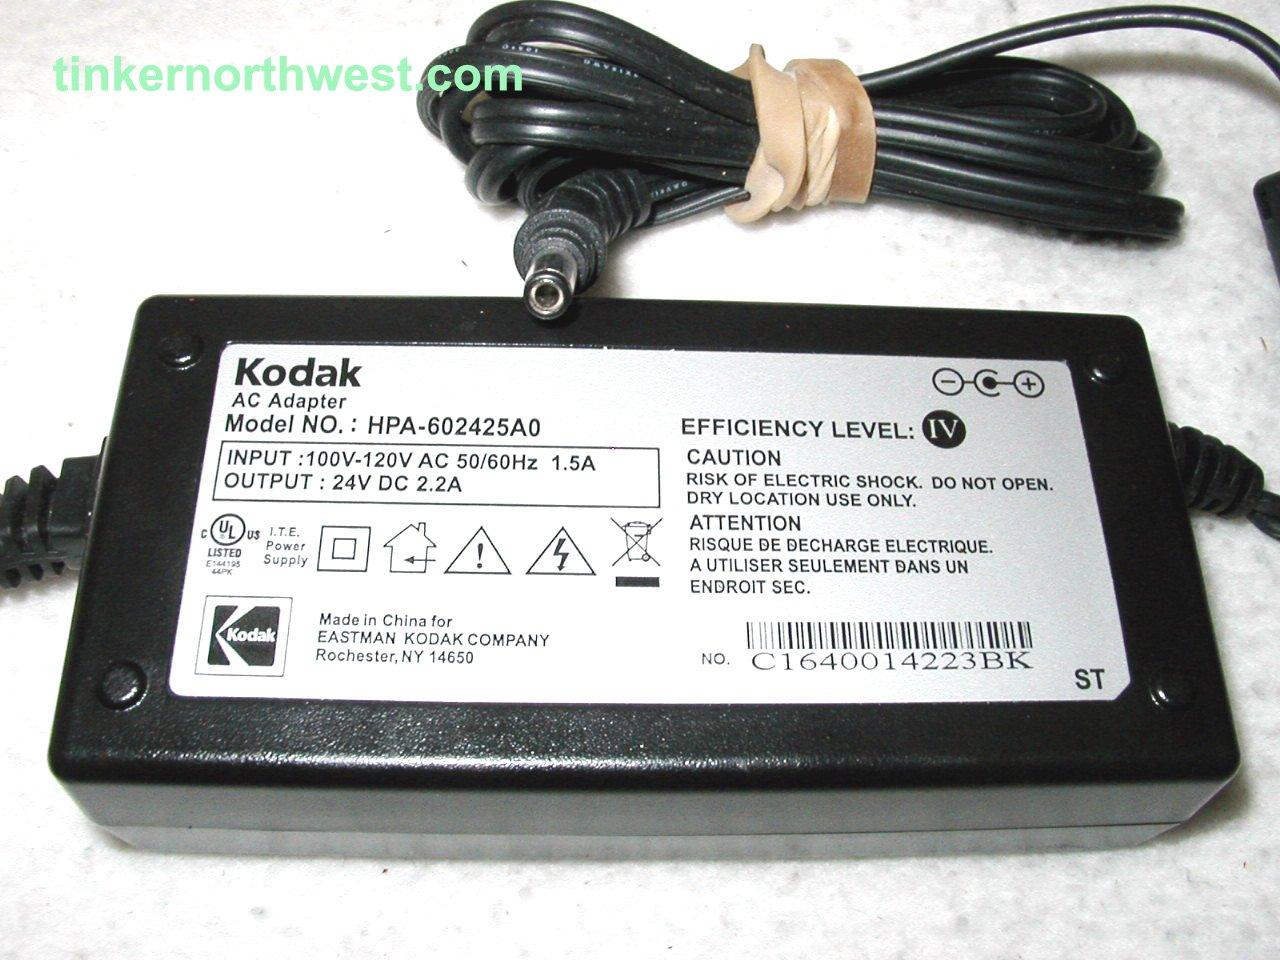 Kodak HPA-602425A0 AC Power Adapter 24VDC 2.2A Easyshare